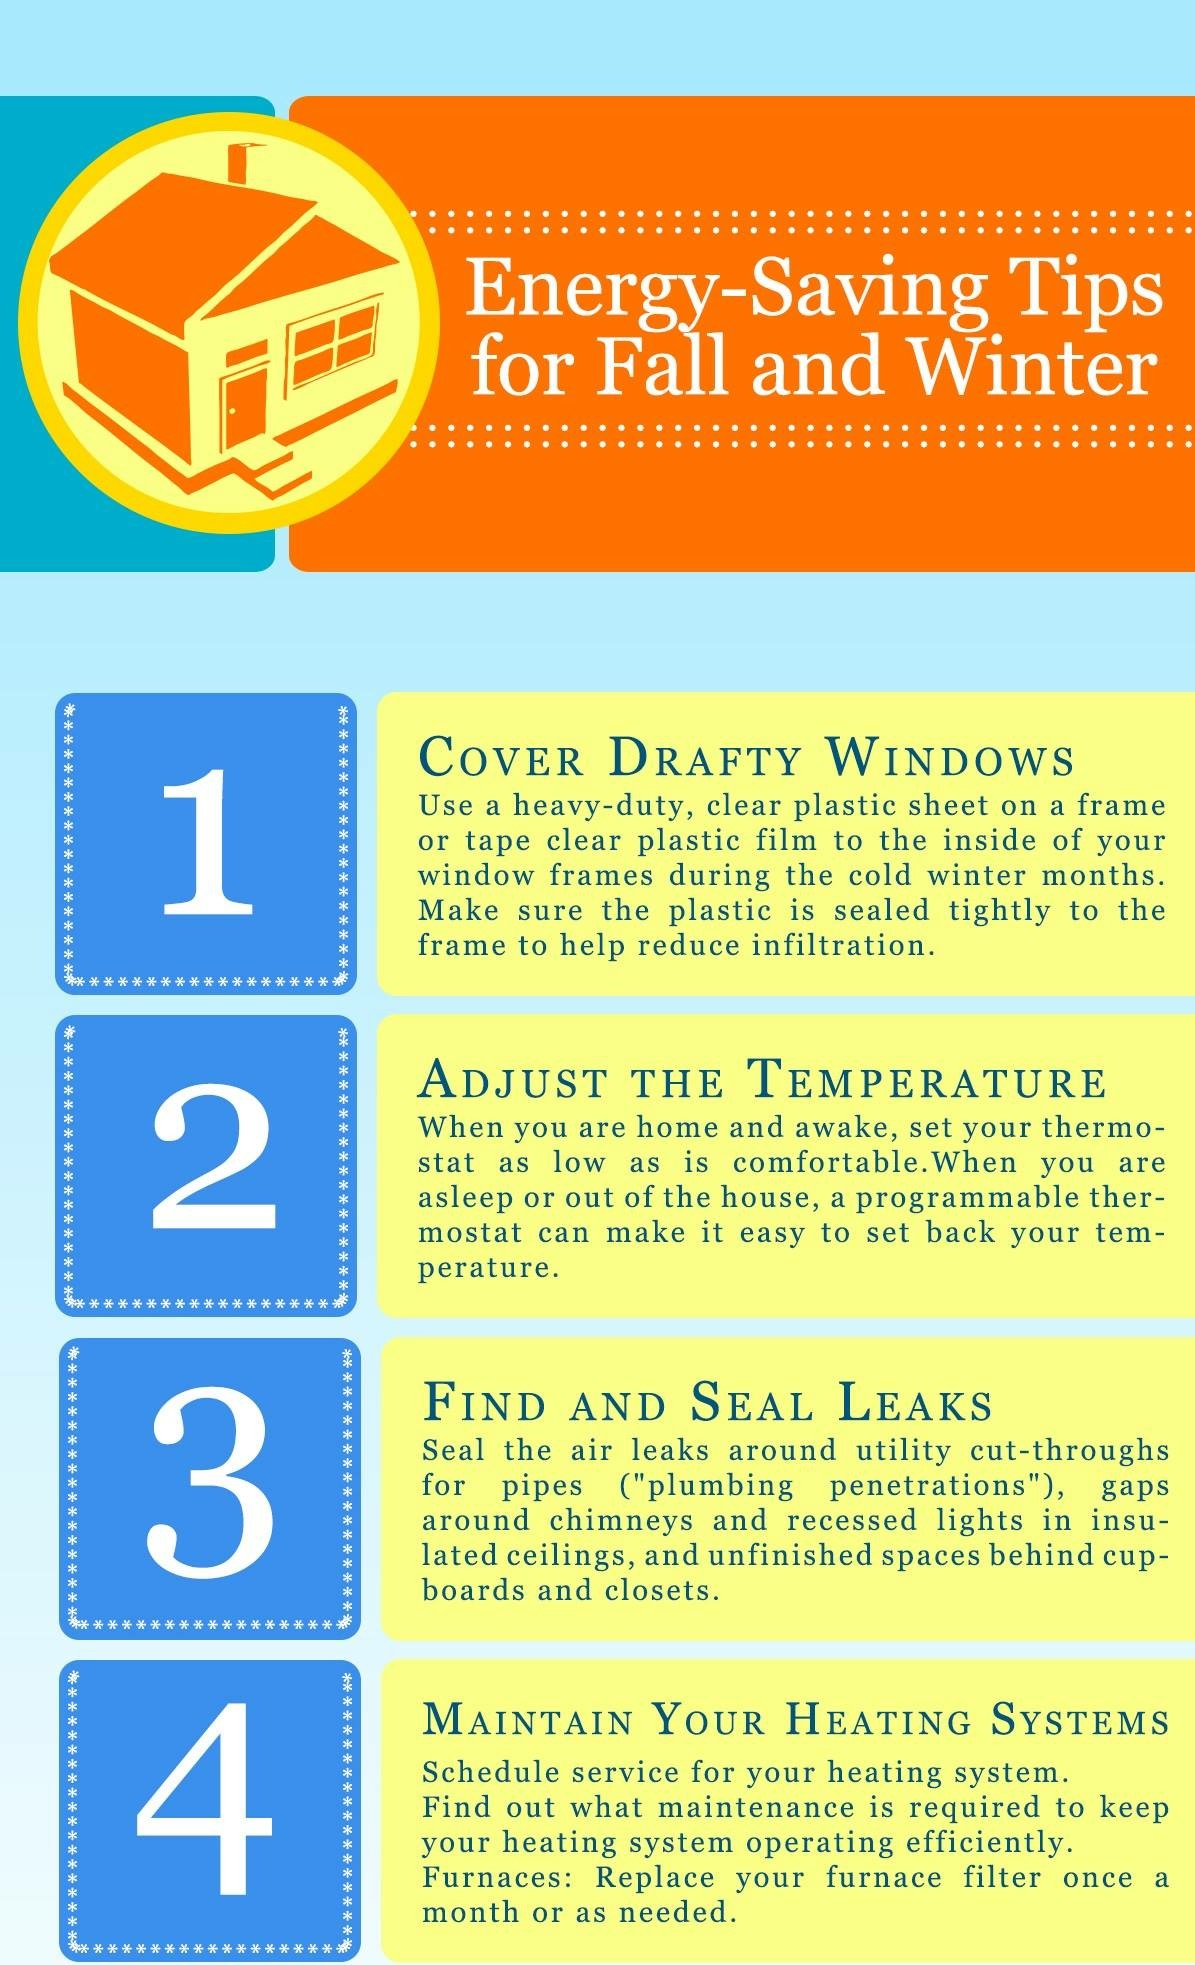 Heating Tips